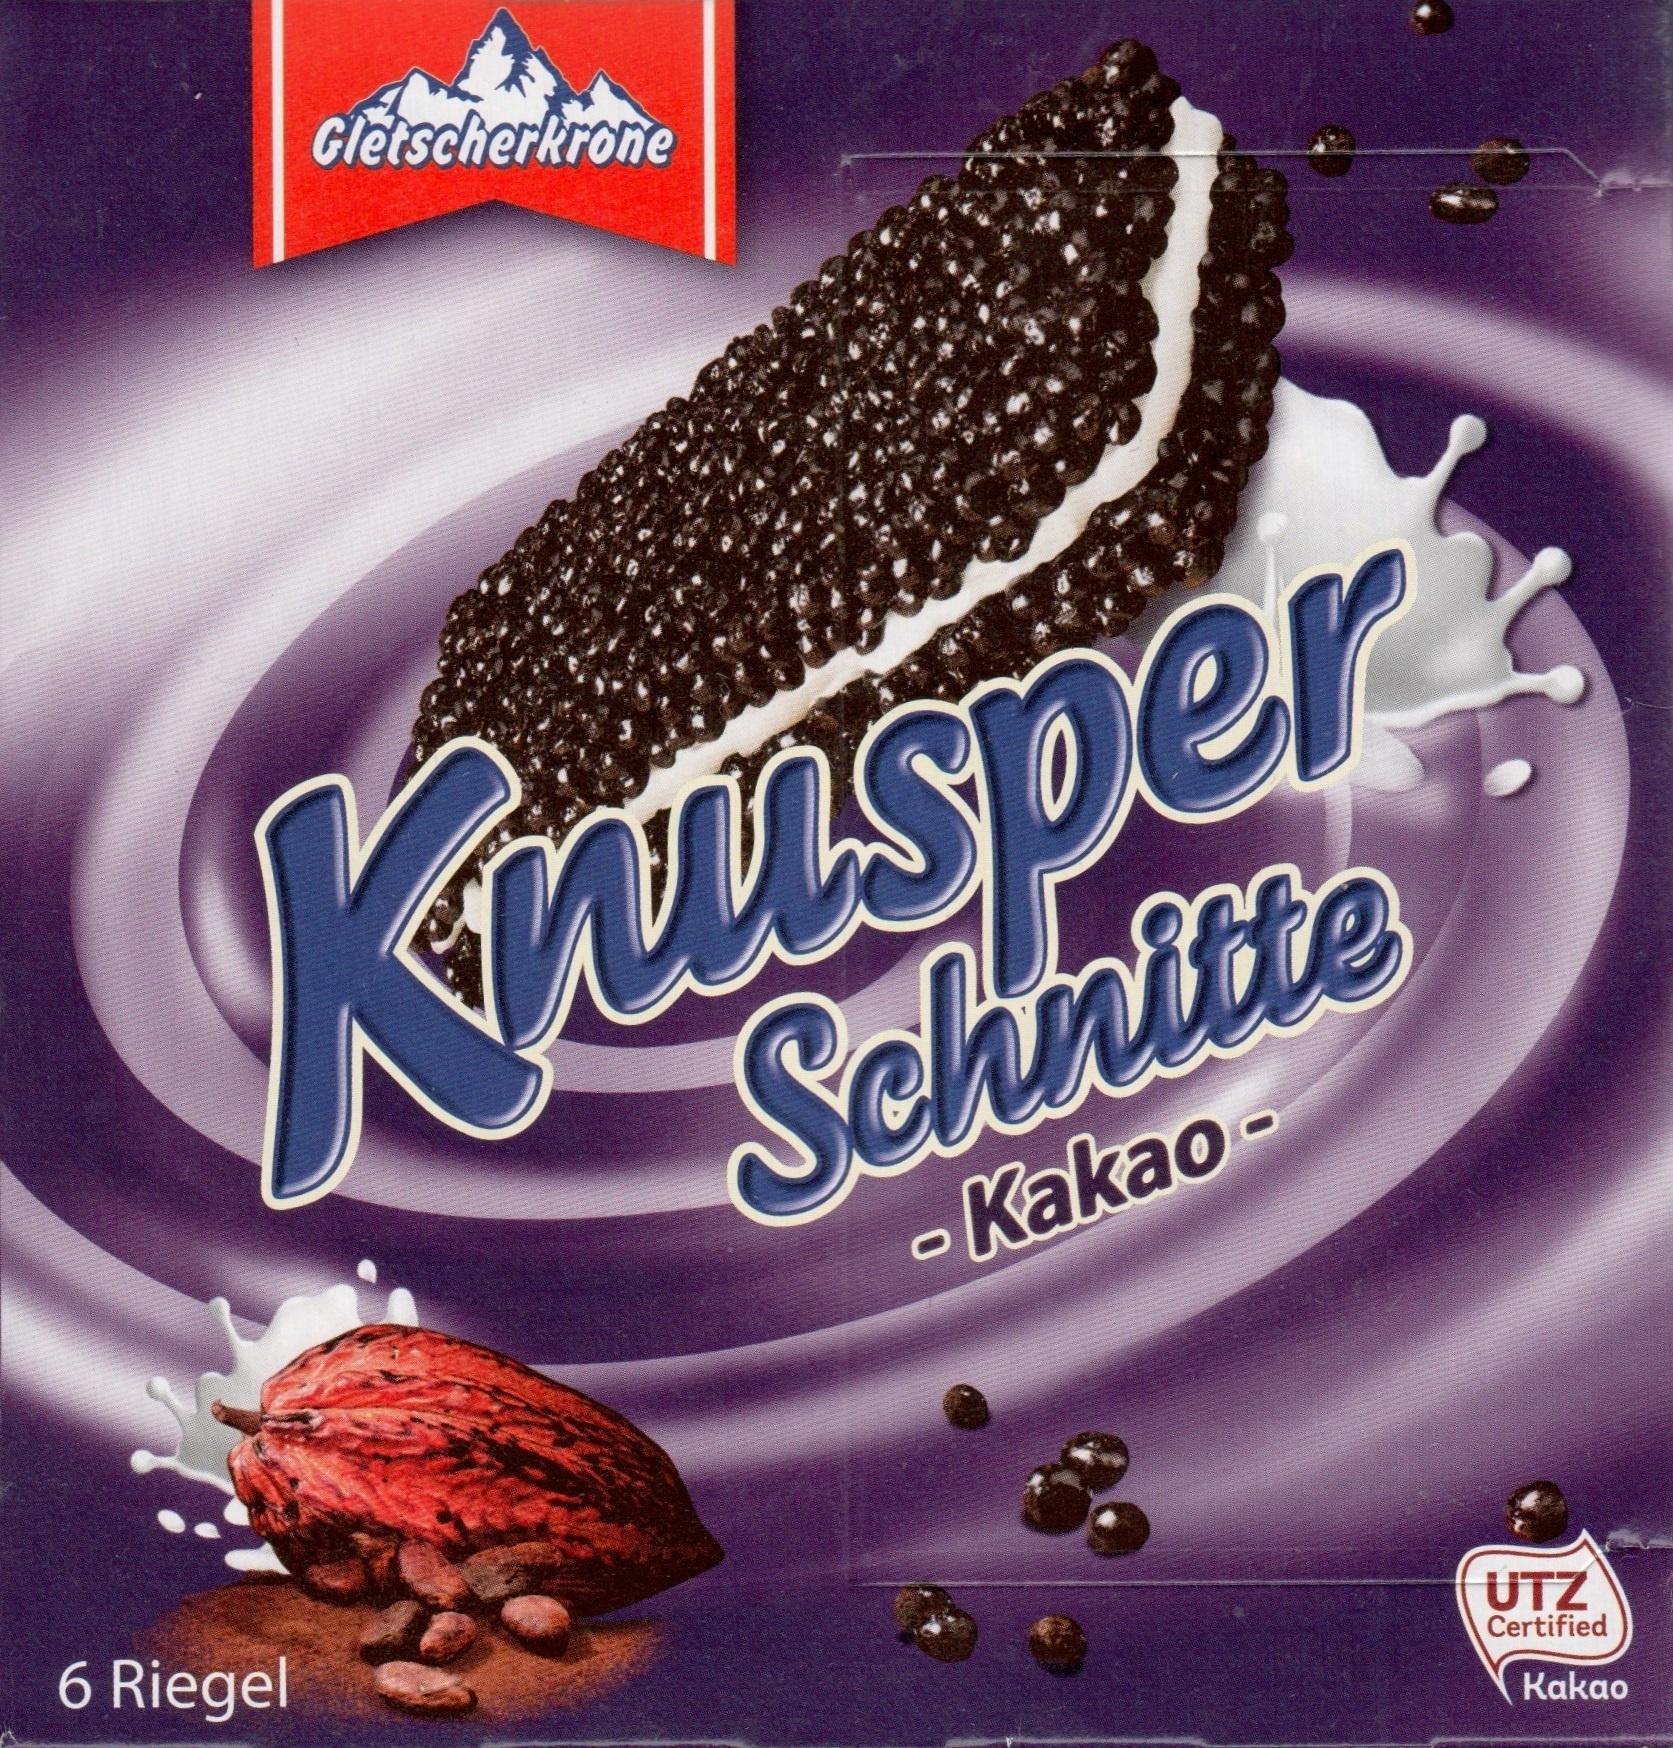 Knusper Schnitte Kakao - Product